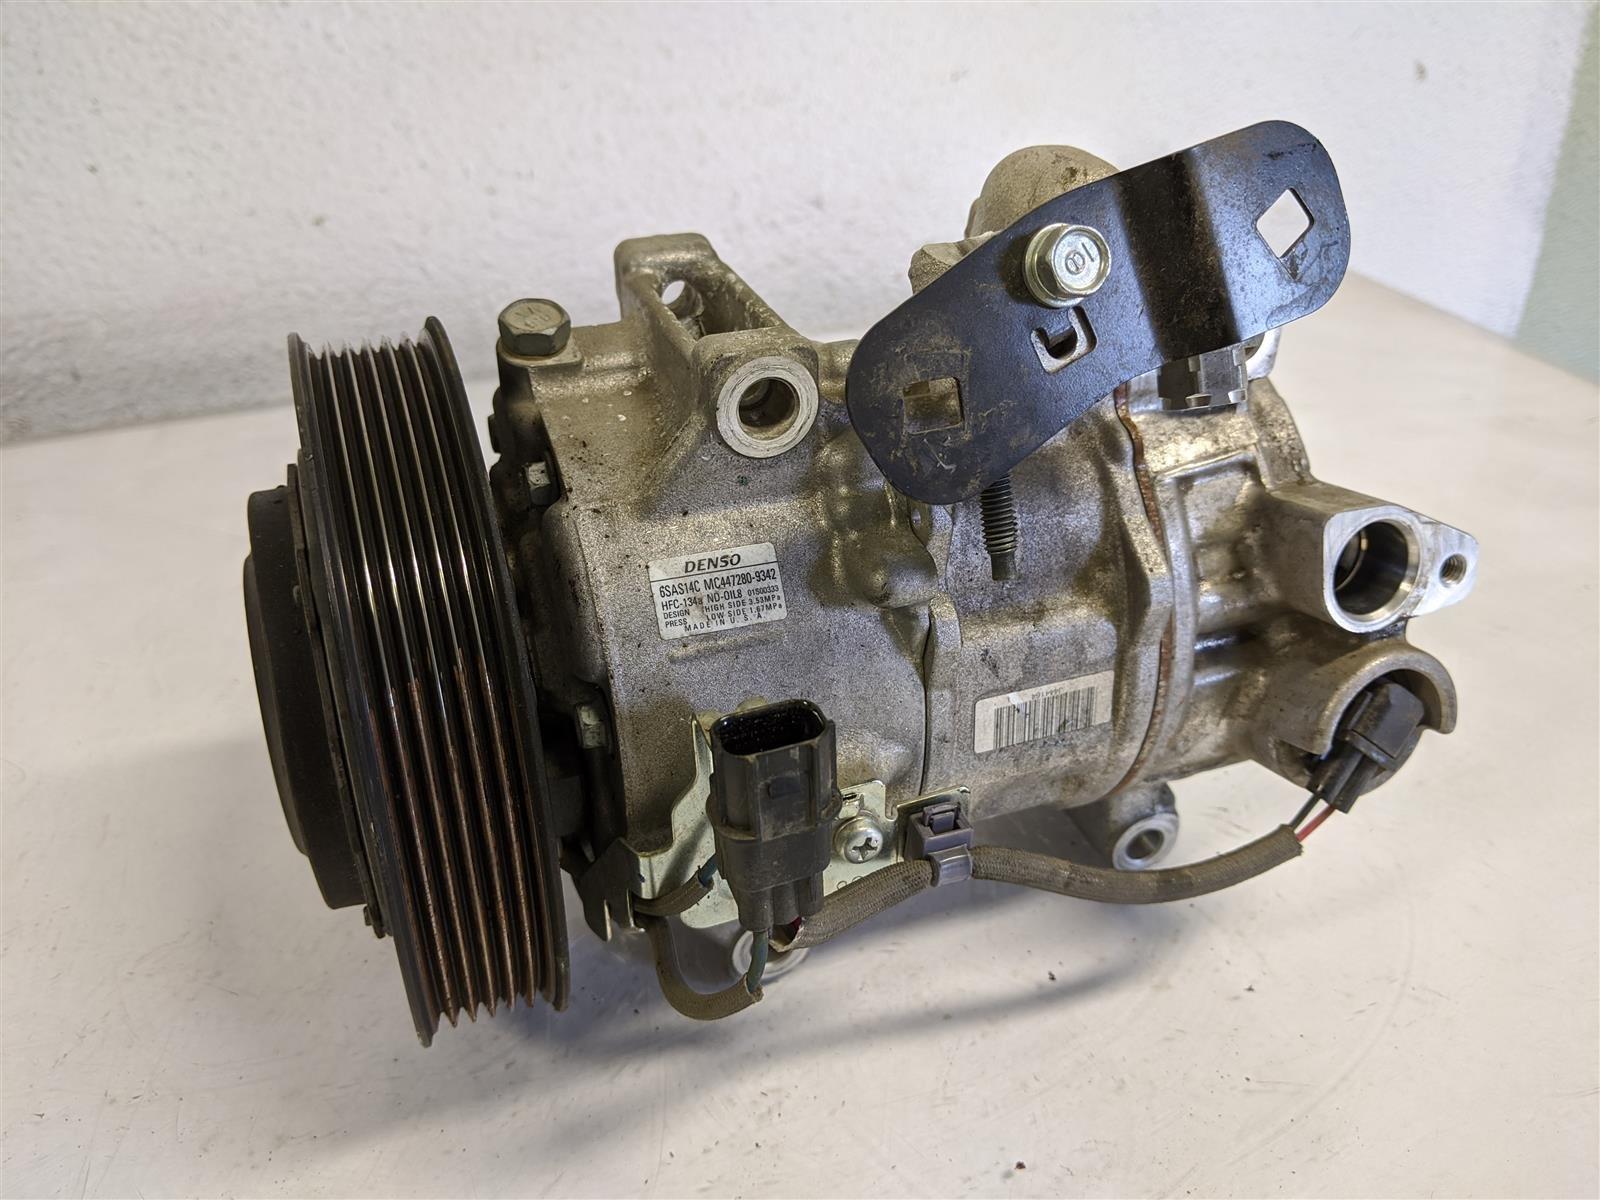 2015 Acura TLX 3.5l Ac Compressor Replacement